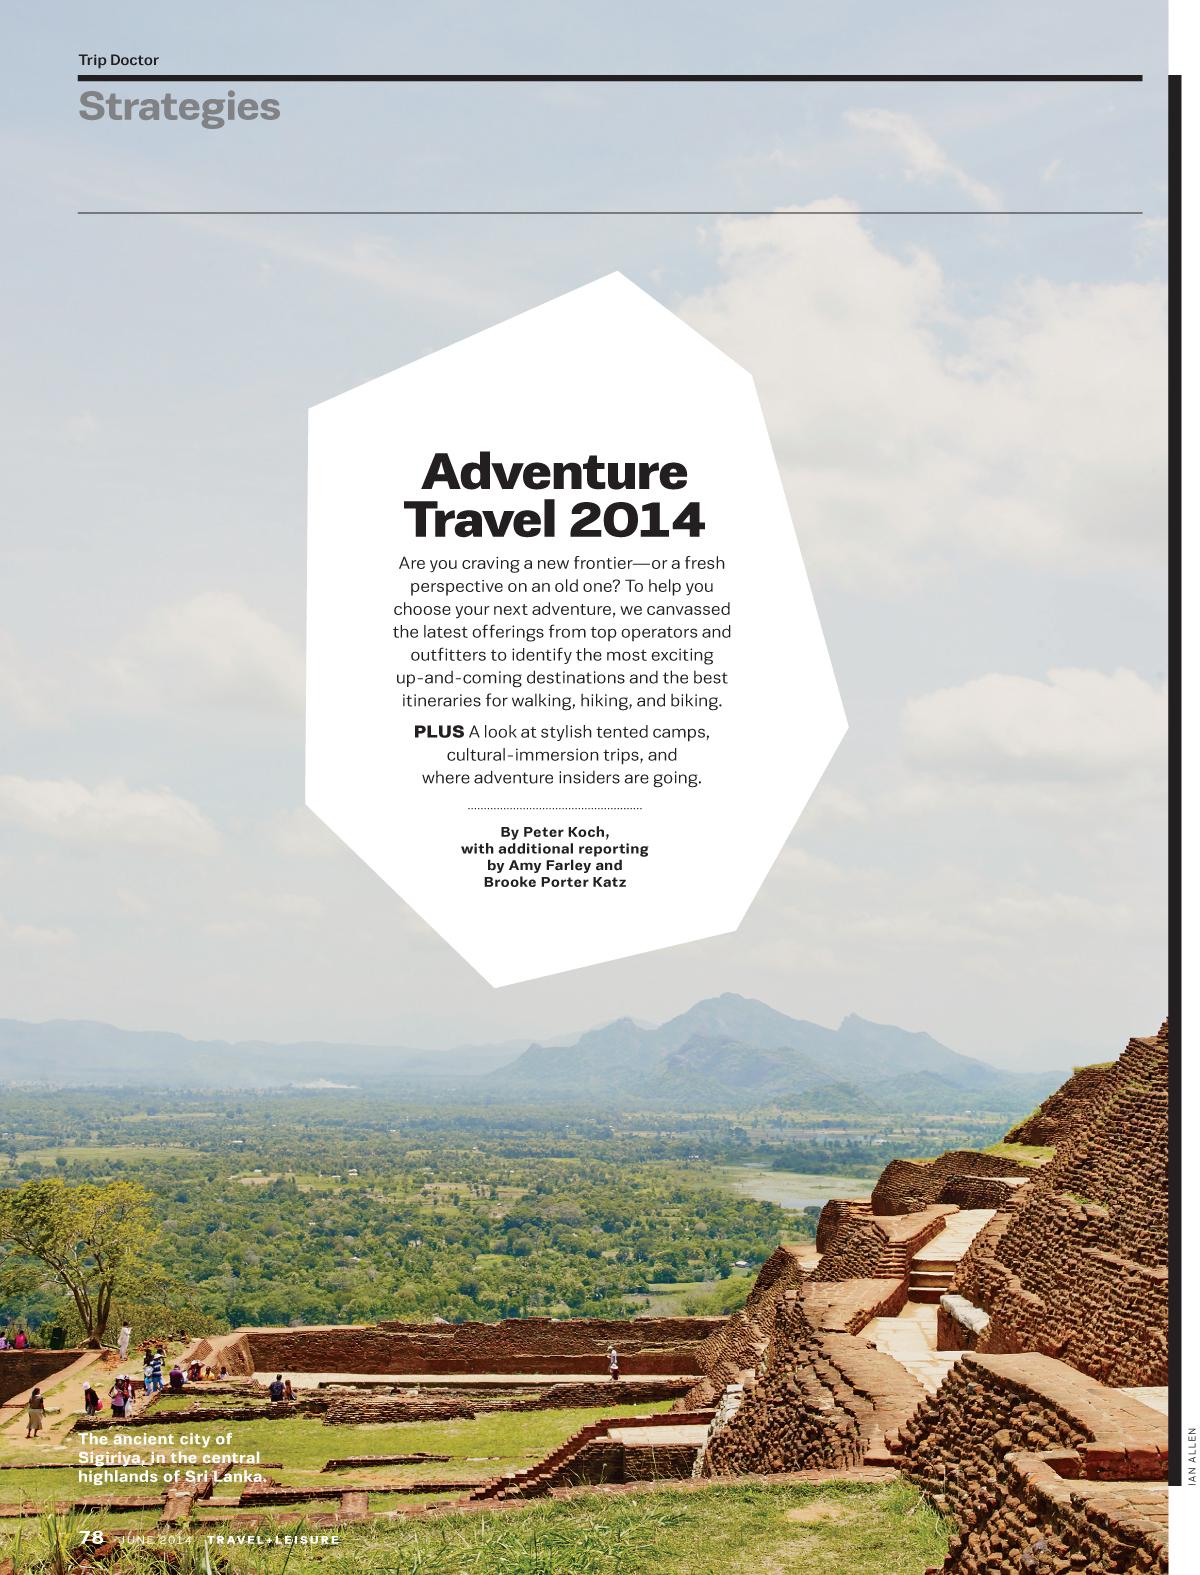 Travel + Leisure, June 2014